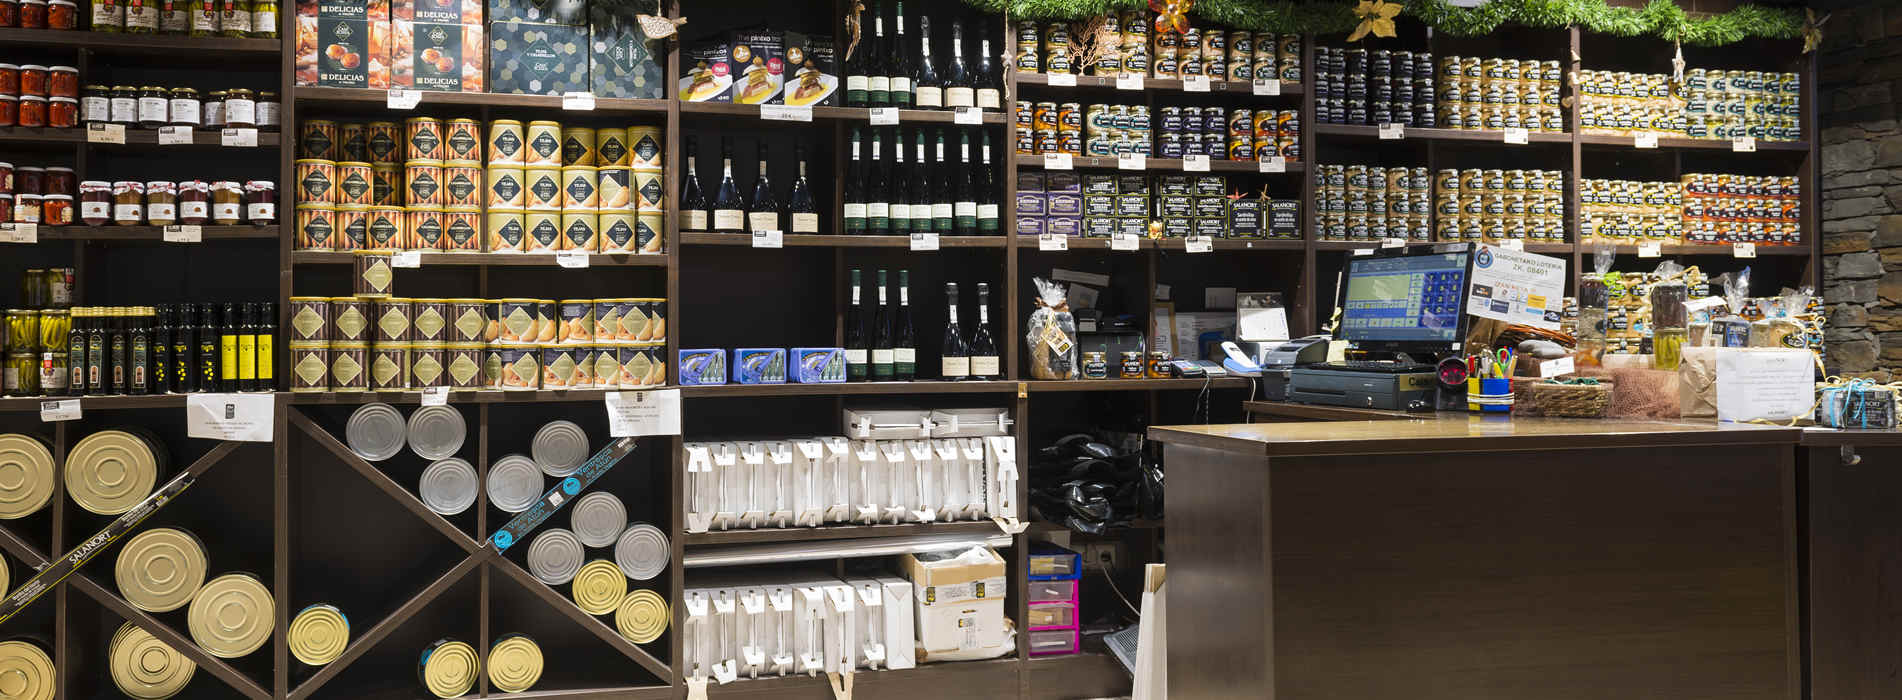 Sale of Salanort products: Salanort octopus, Salanort Getaria anchovies, Salanort Bay of Biscay white tuna, Salanort white tuna belly, Salanort preserves.